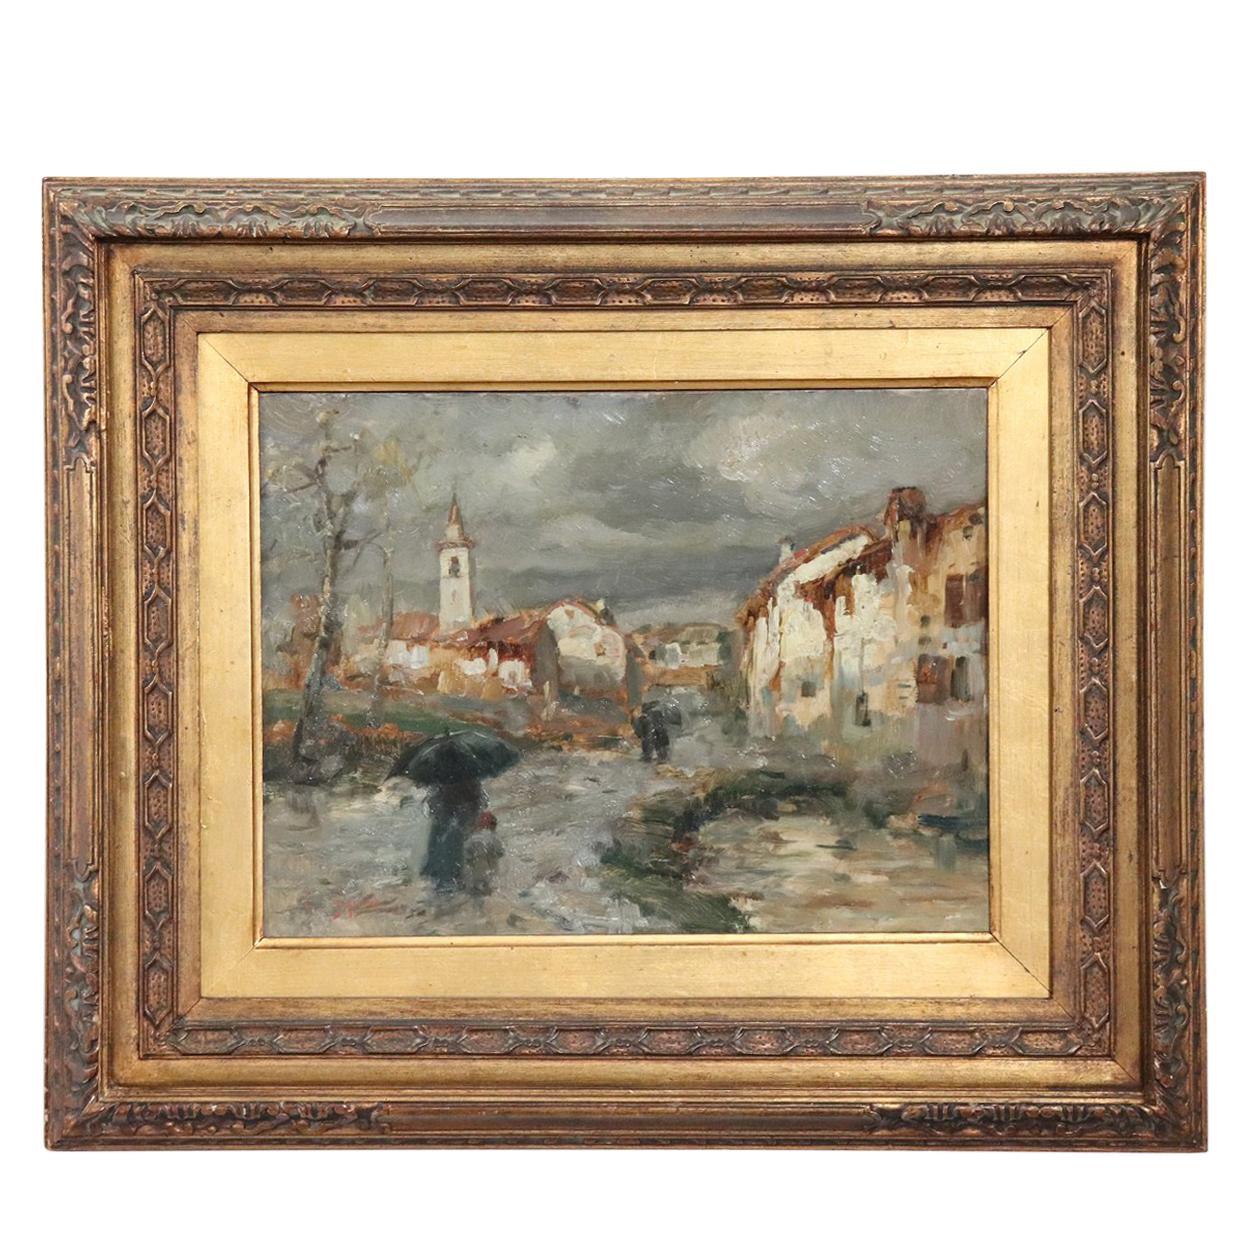 19th Century Important Italian Artis Oil Painting on Hardboard Landscape